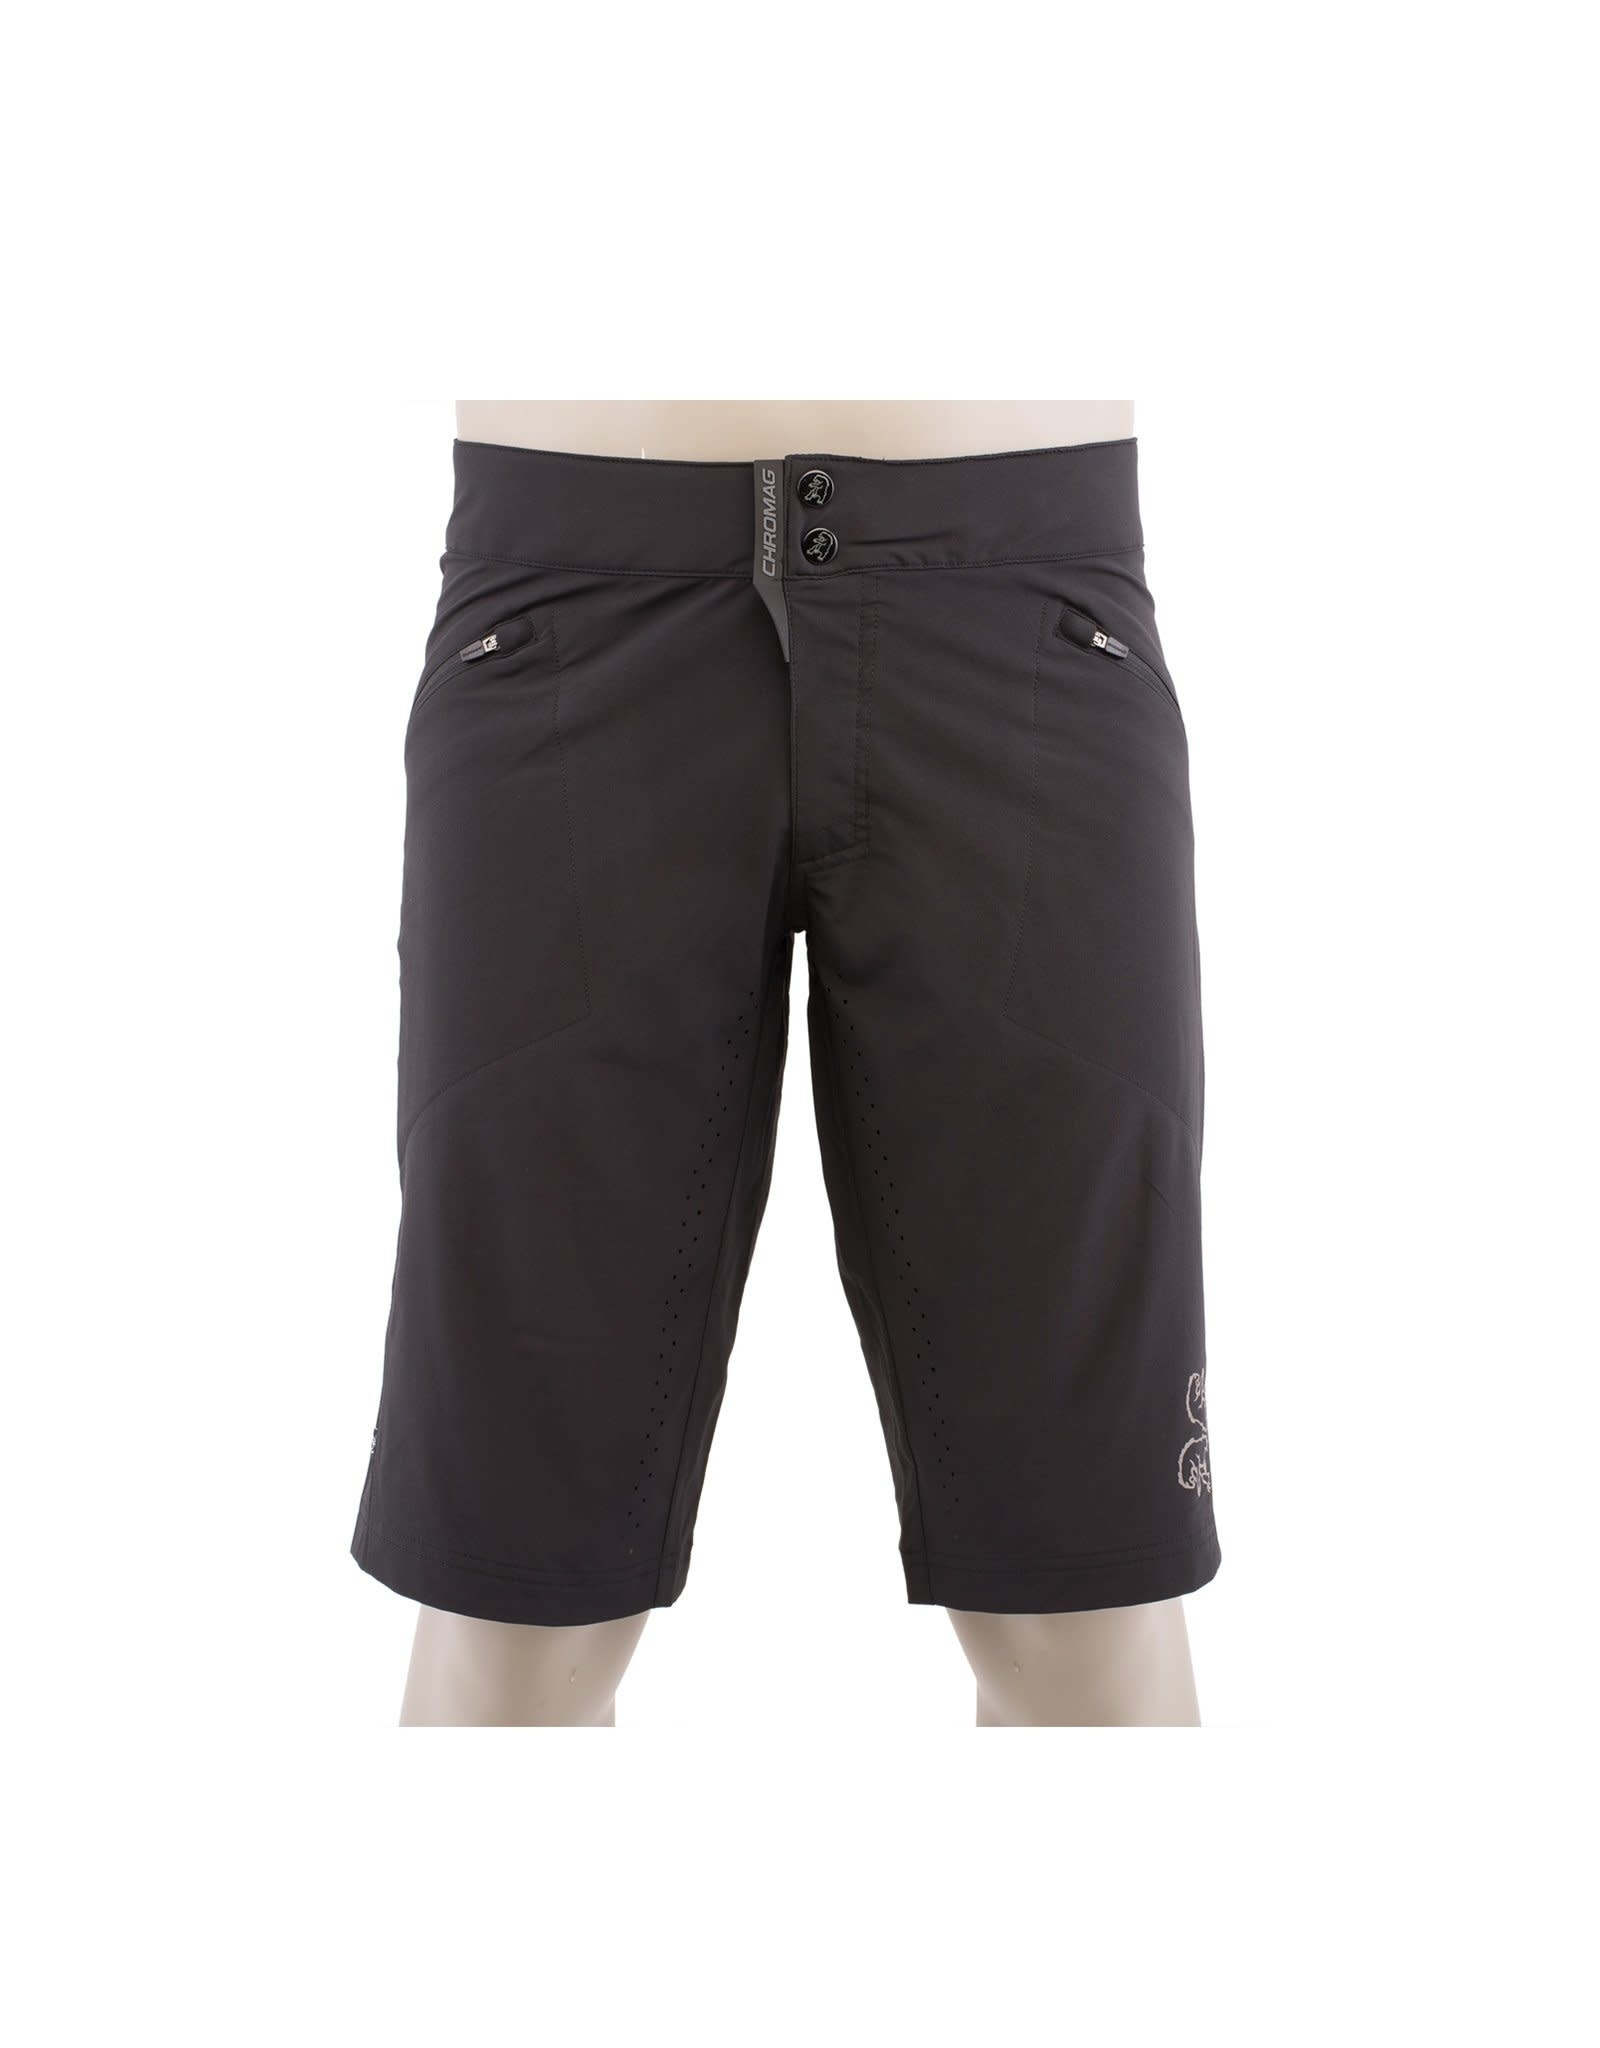 Chromag Ambit Short